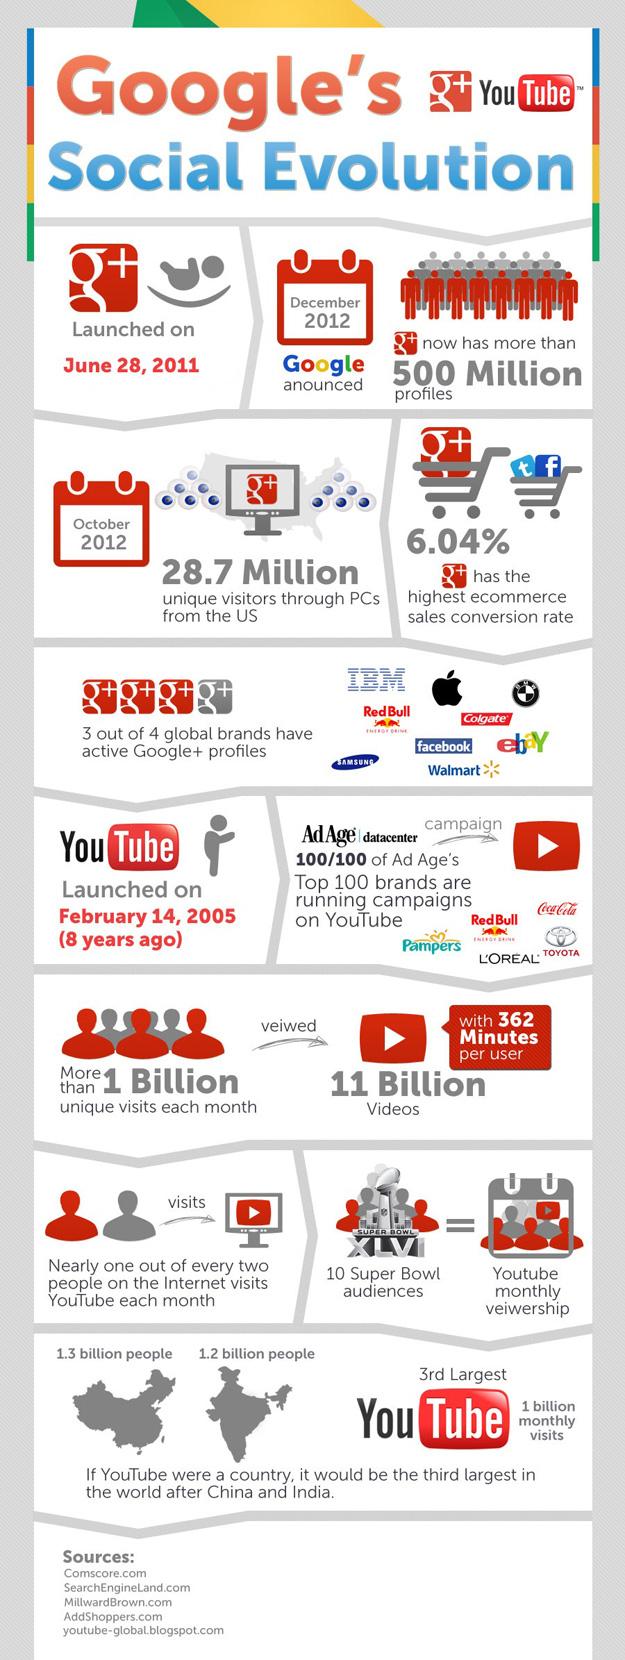 Google's Social Evolution